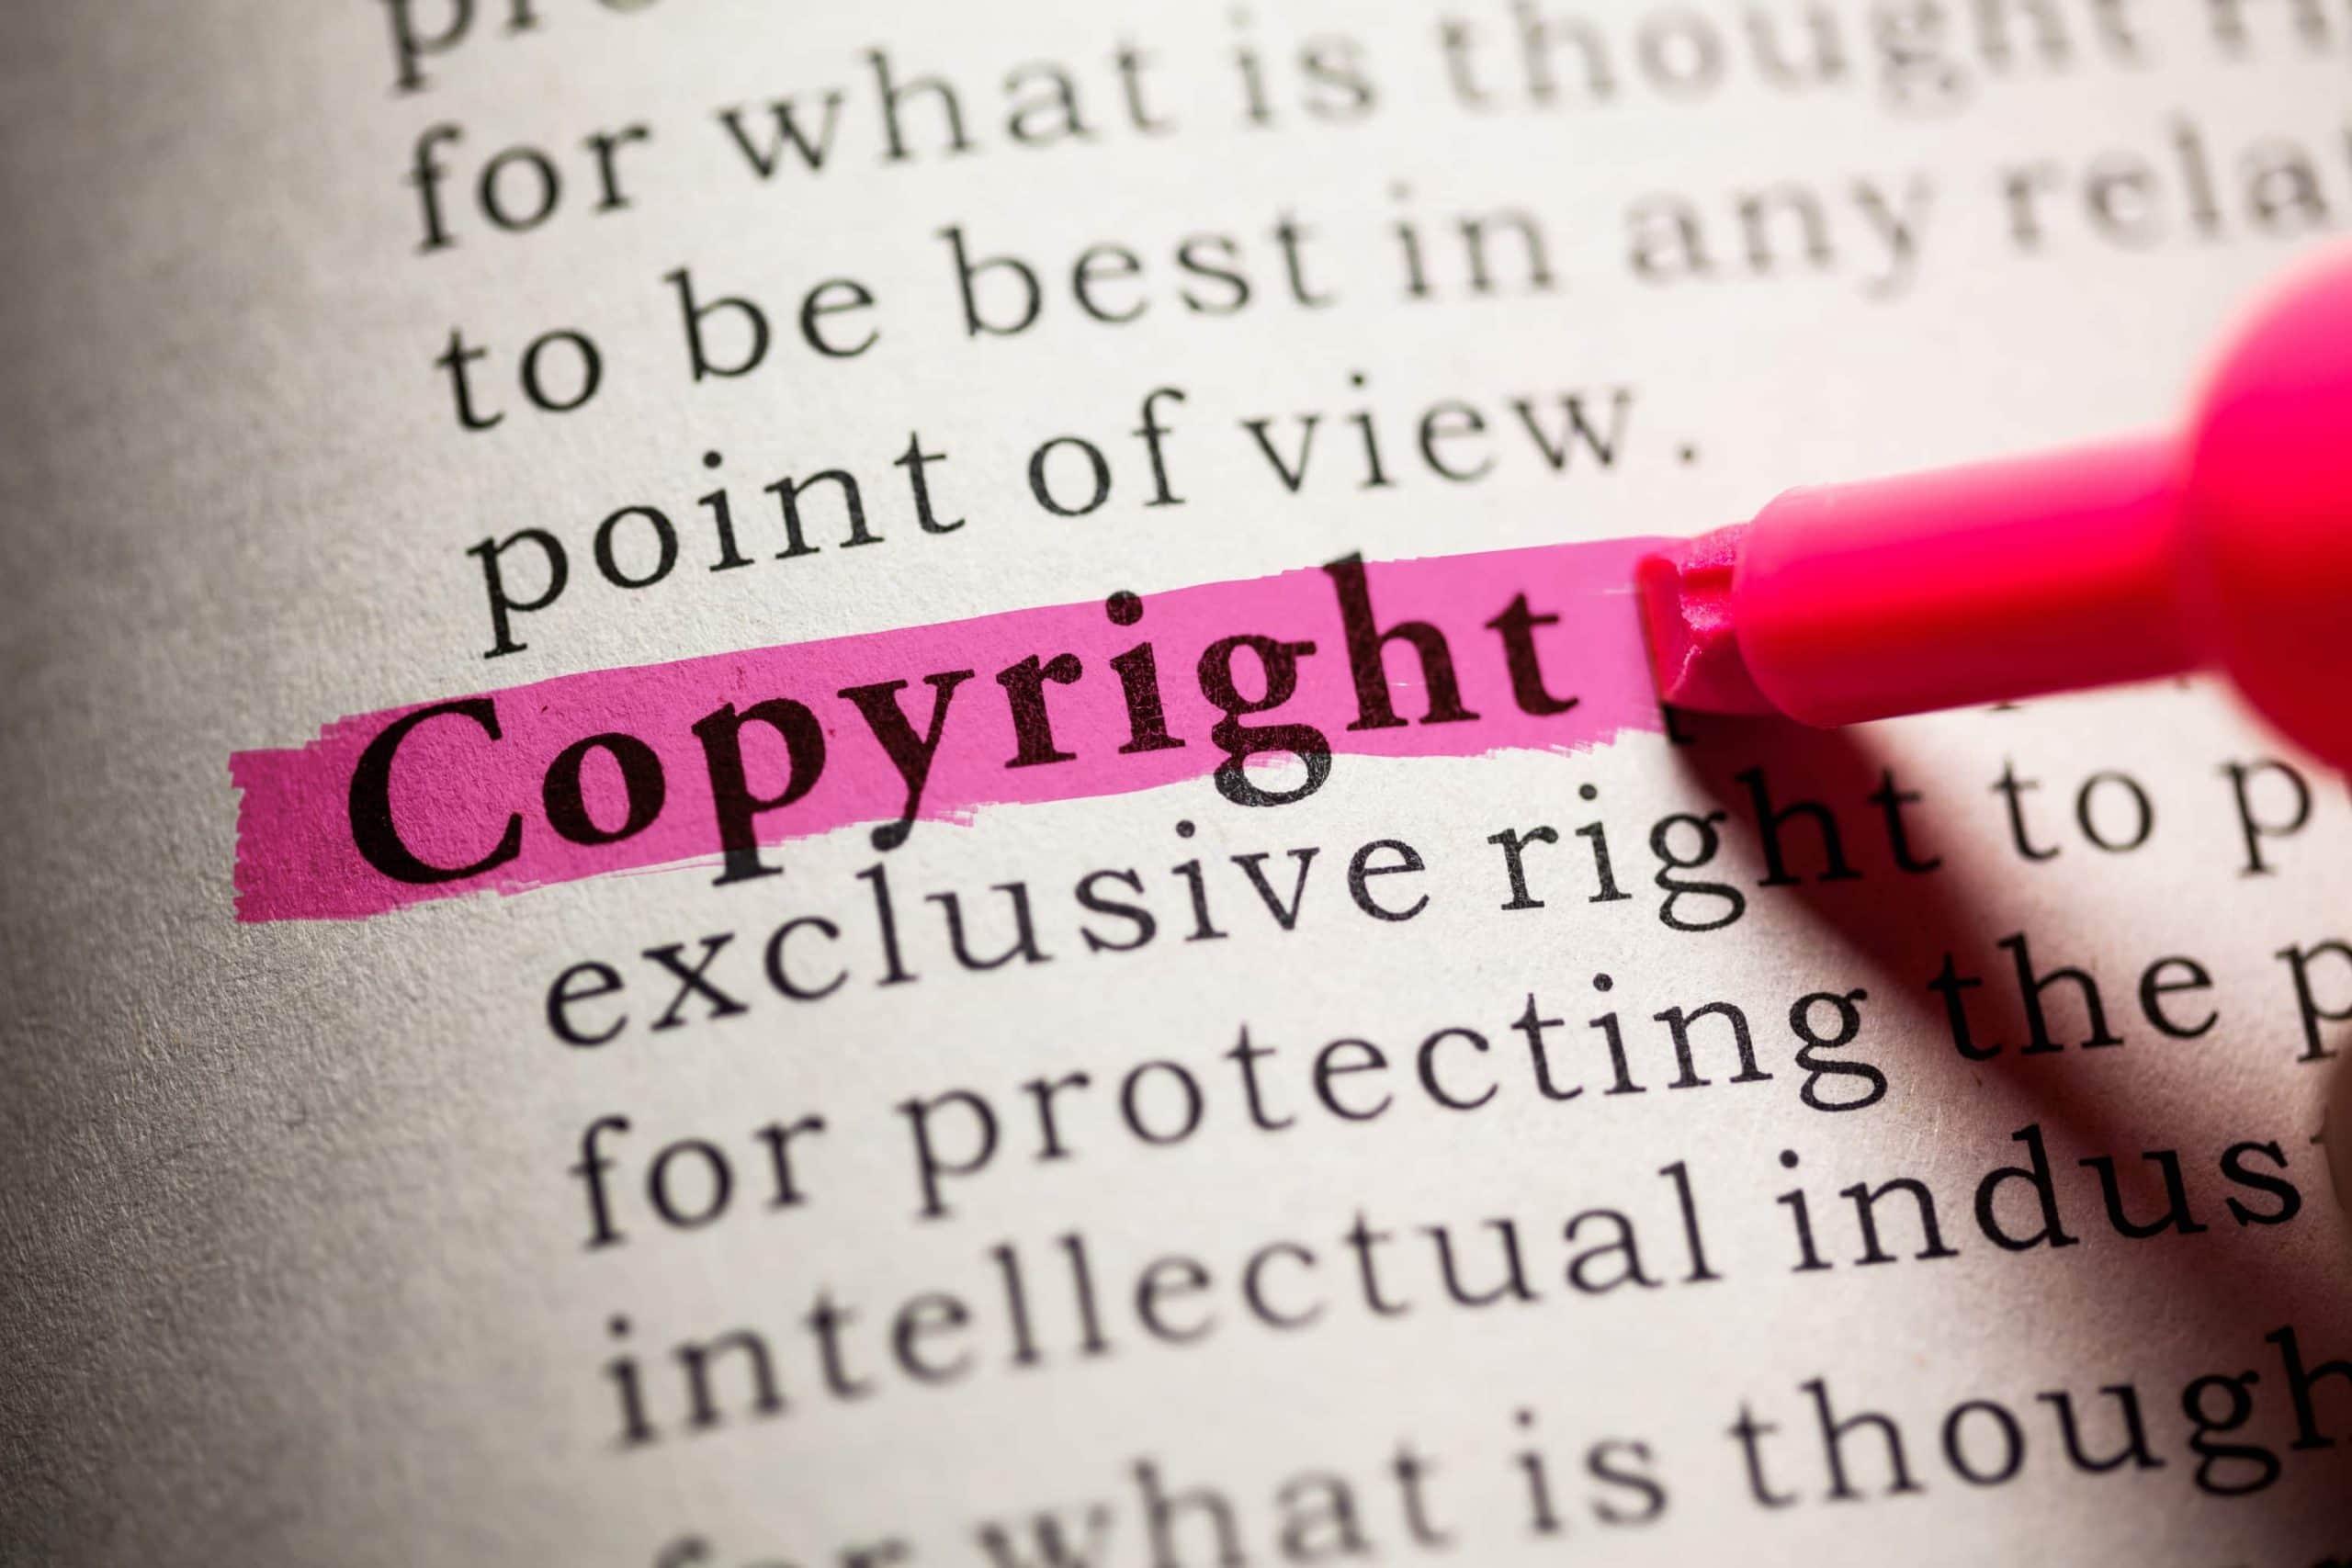 Copyright, markiert mit pinkem Textmarker